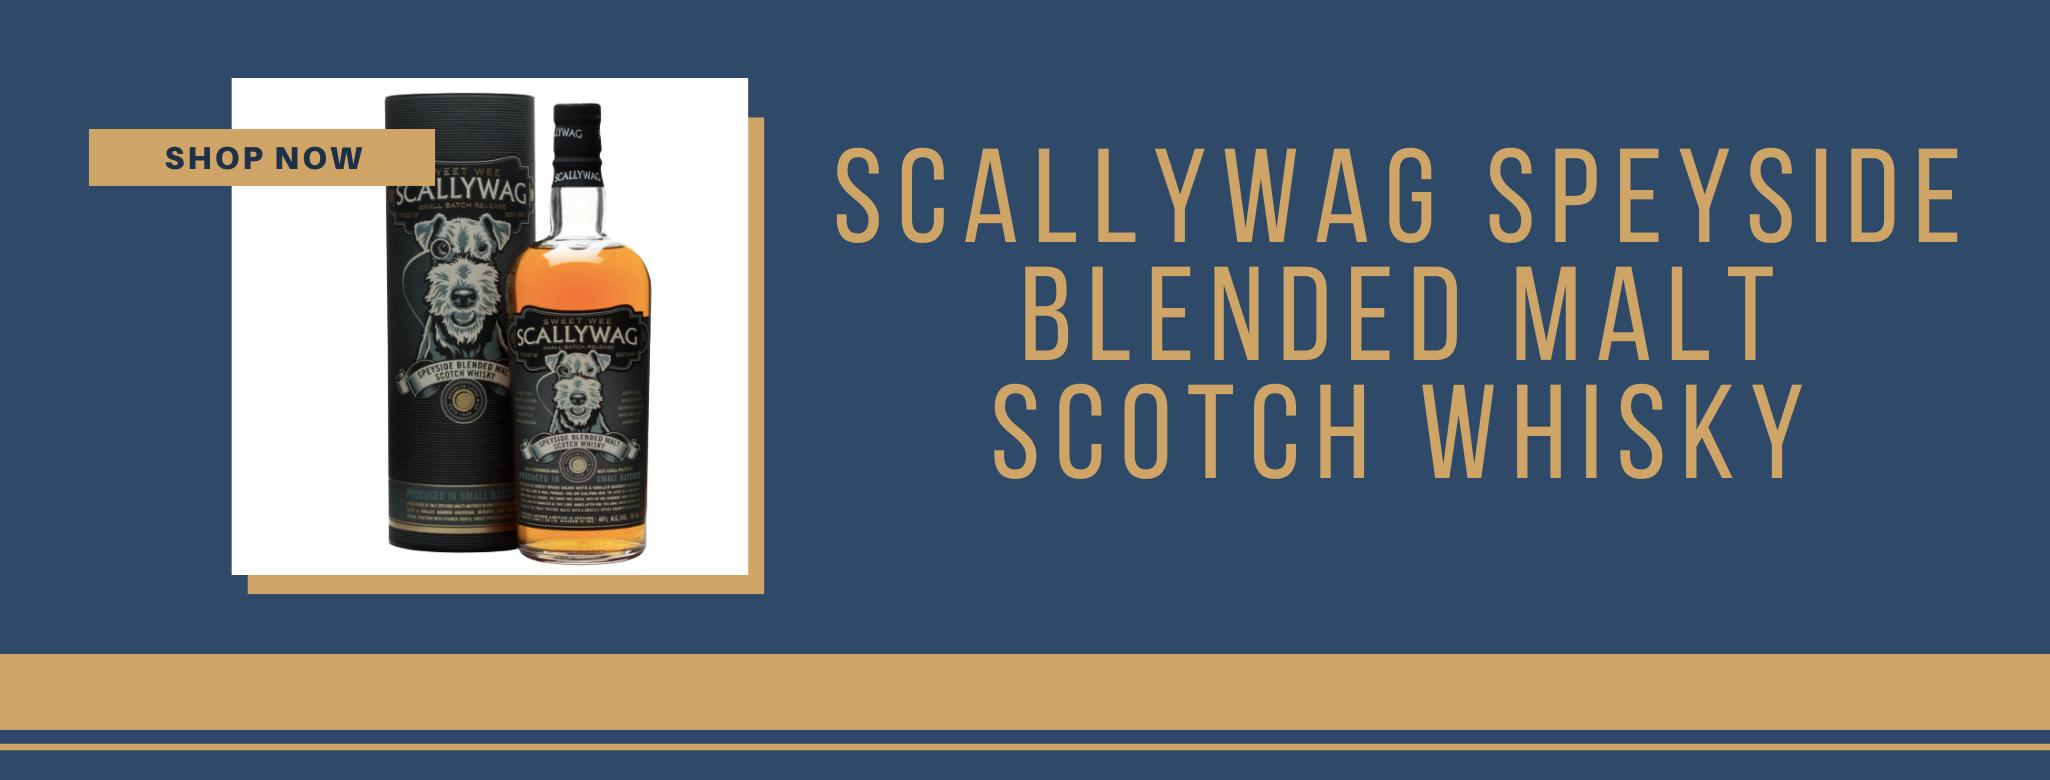 Buy Scallywag Speyside Blended Malt Scotch Whisky